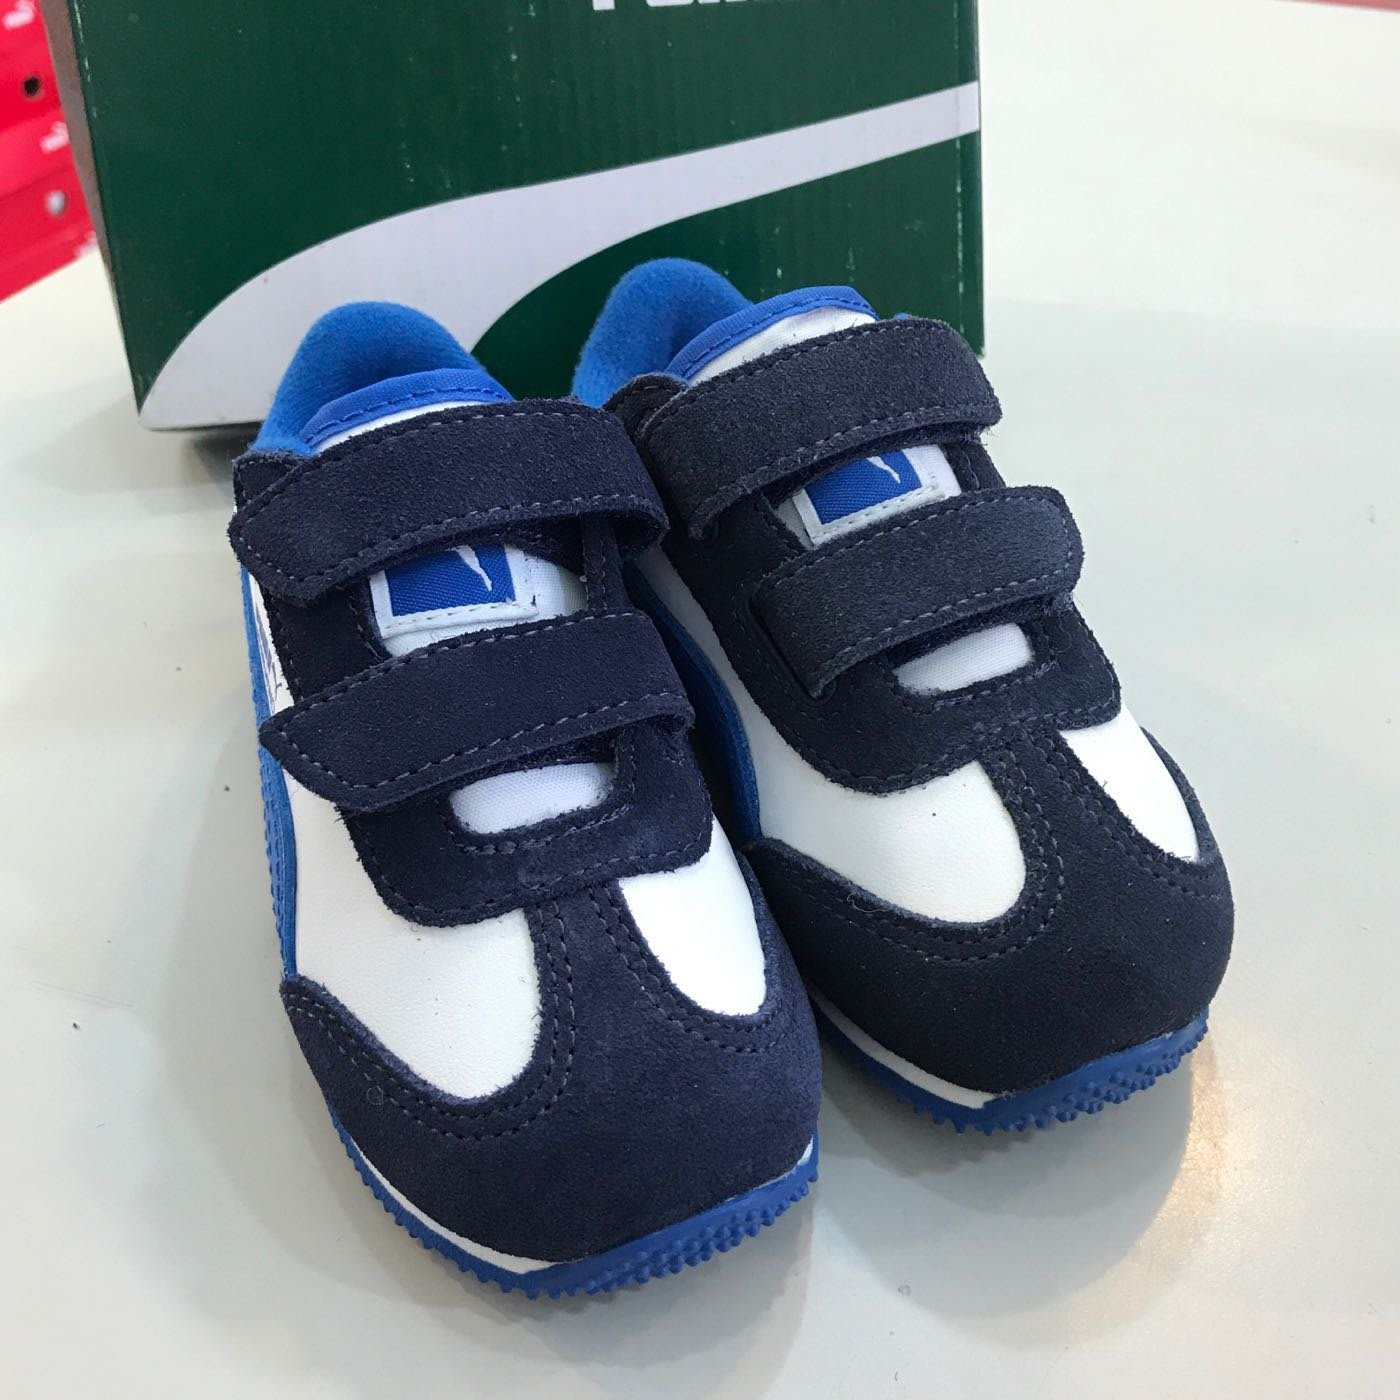 Puma WHIRLWIND L V INF男小童 復古慢跑鞋 藍白 特價販售 35434830